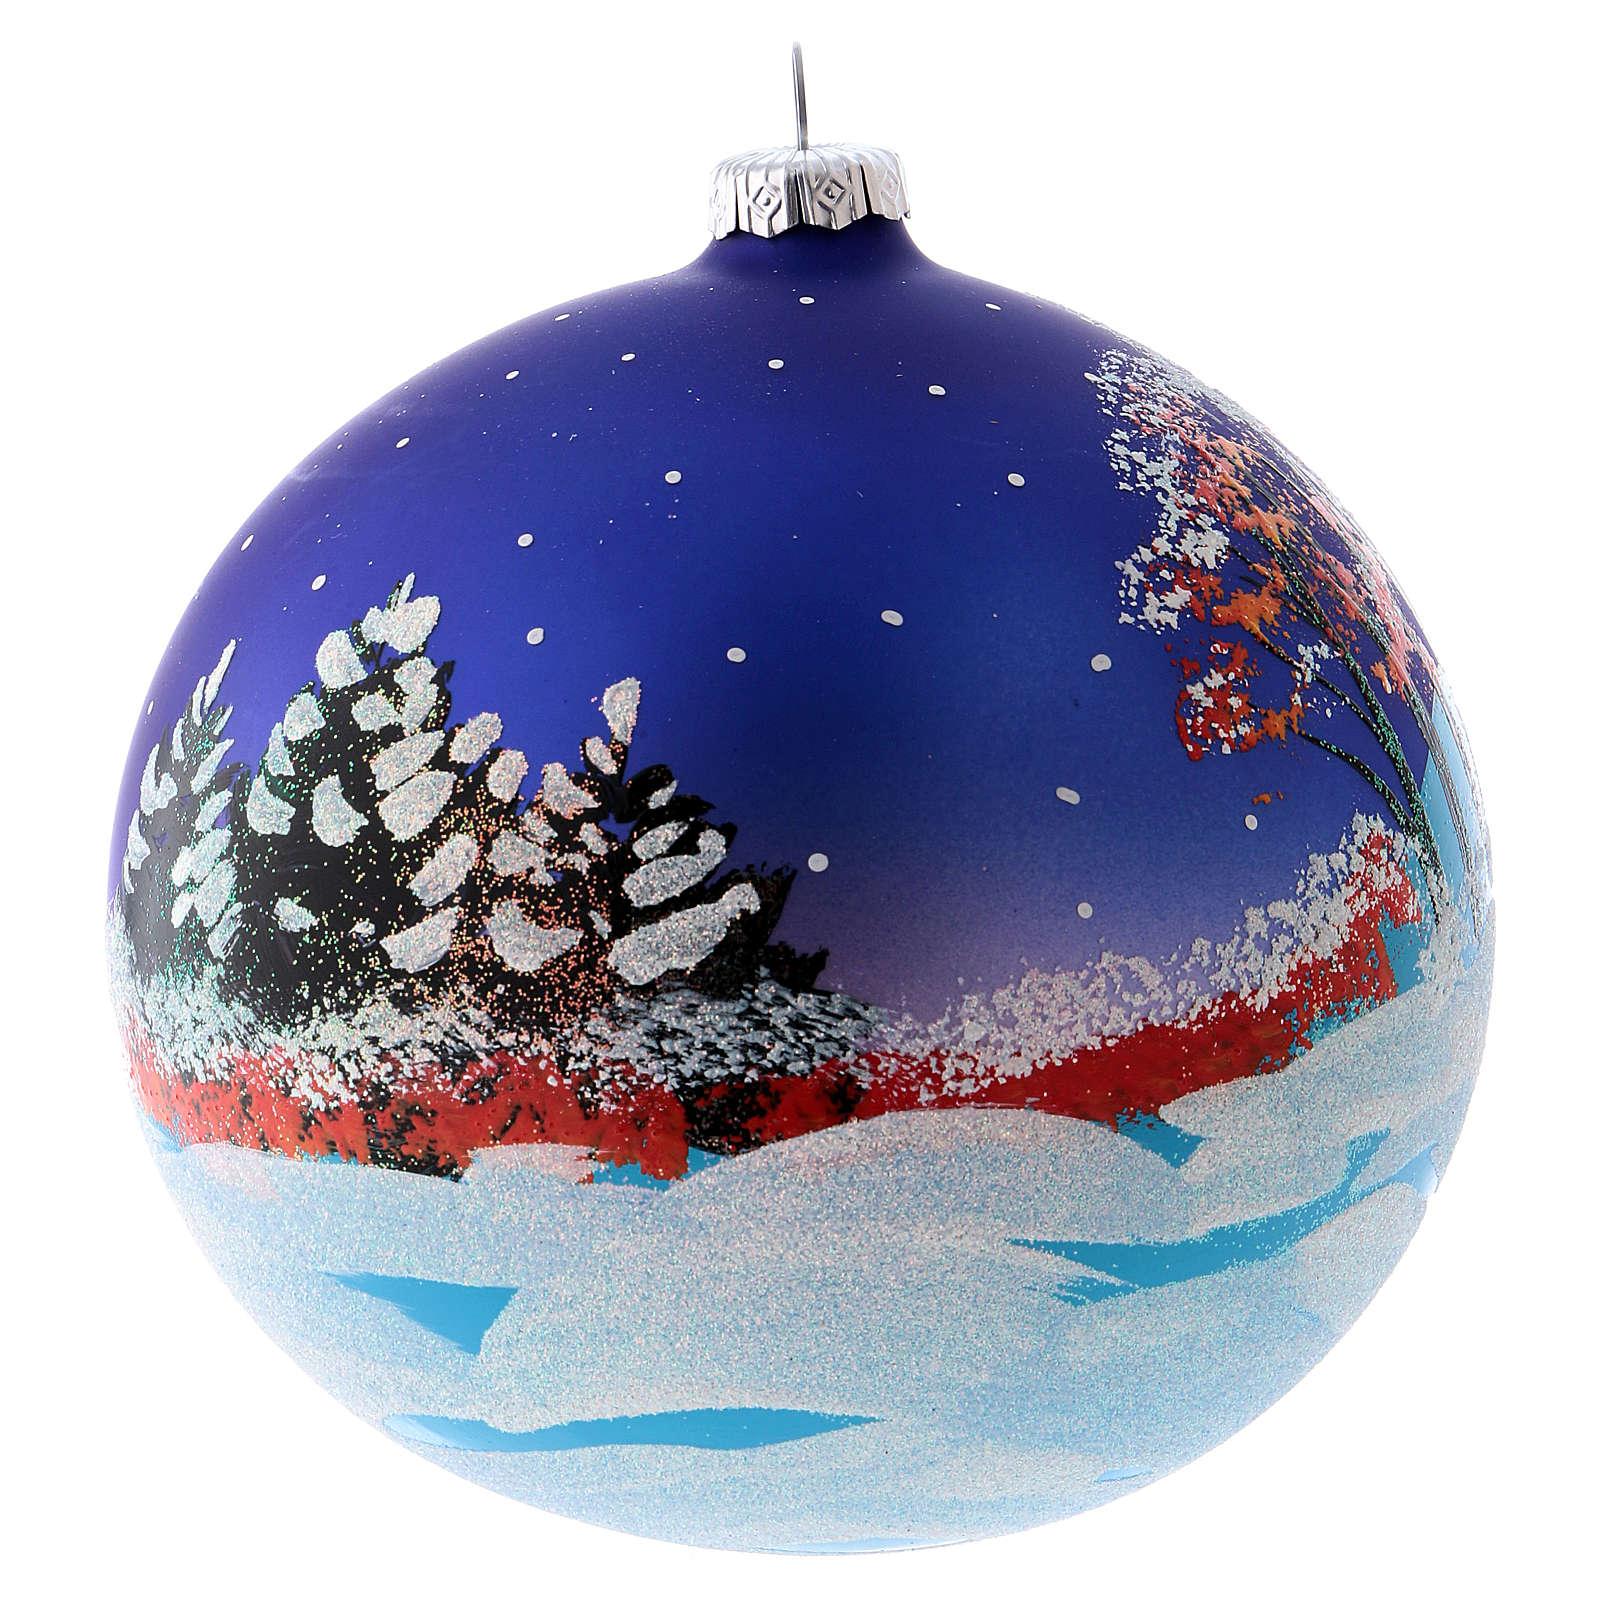 Blown glass ball Christmas ornament with night snowy scene 15 cm 4